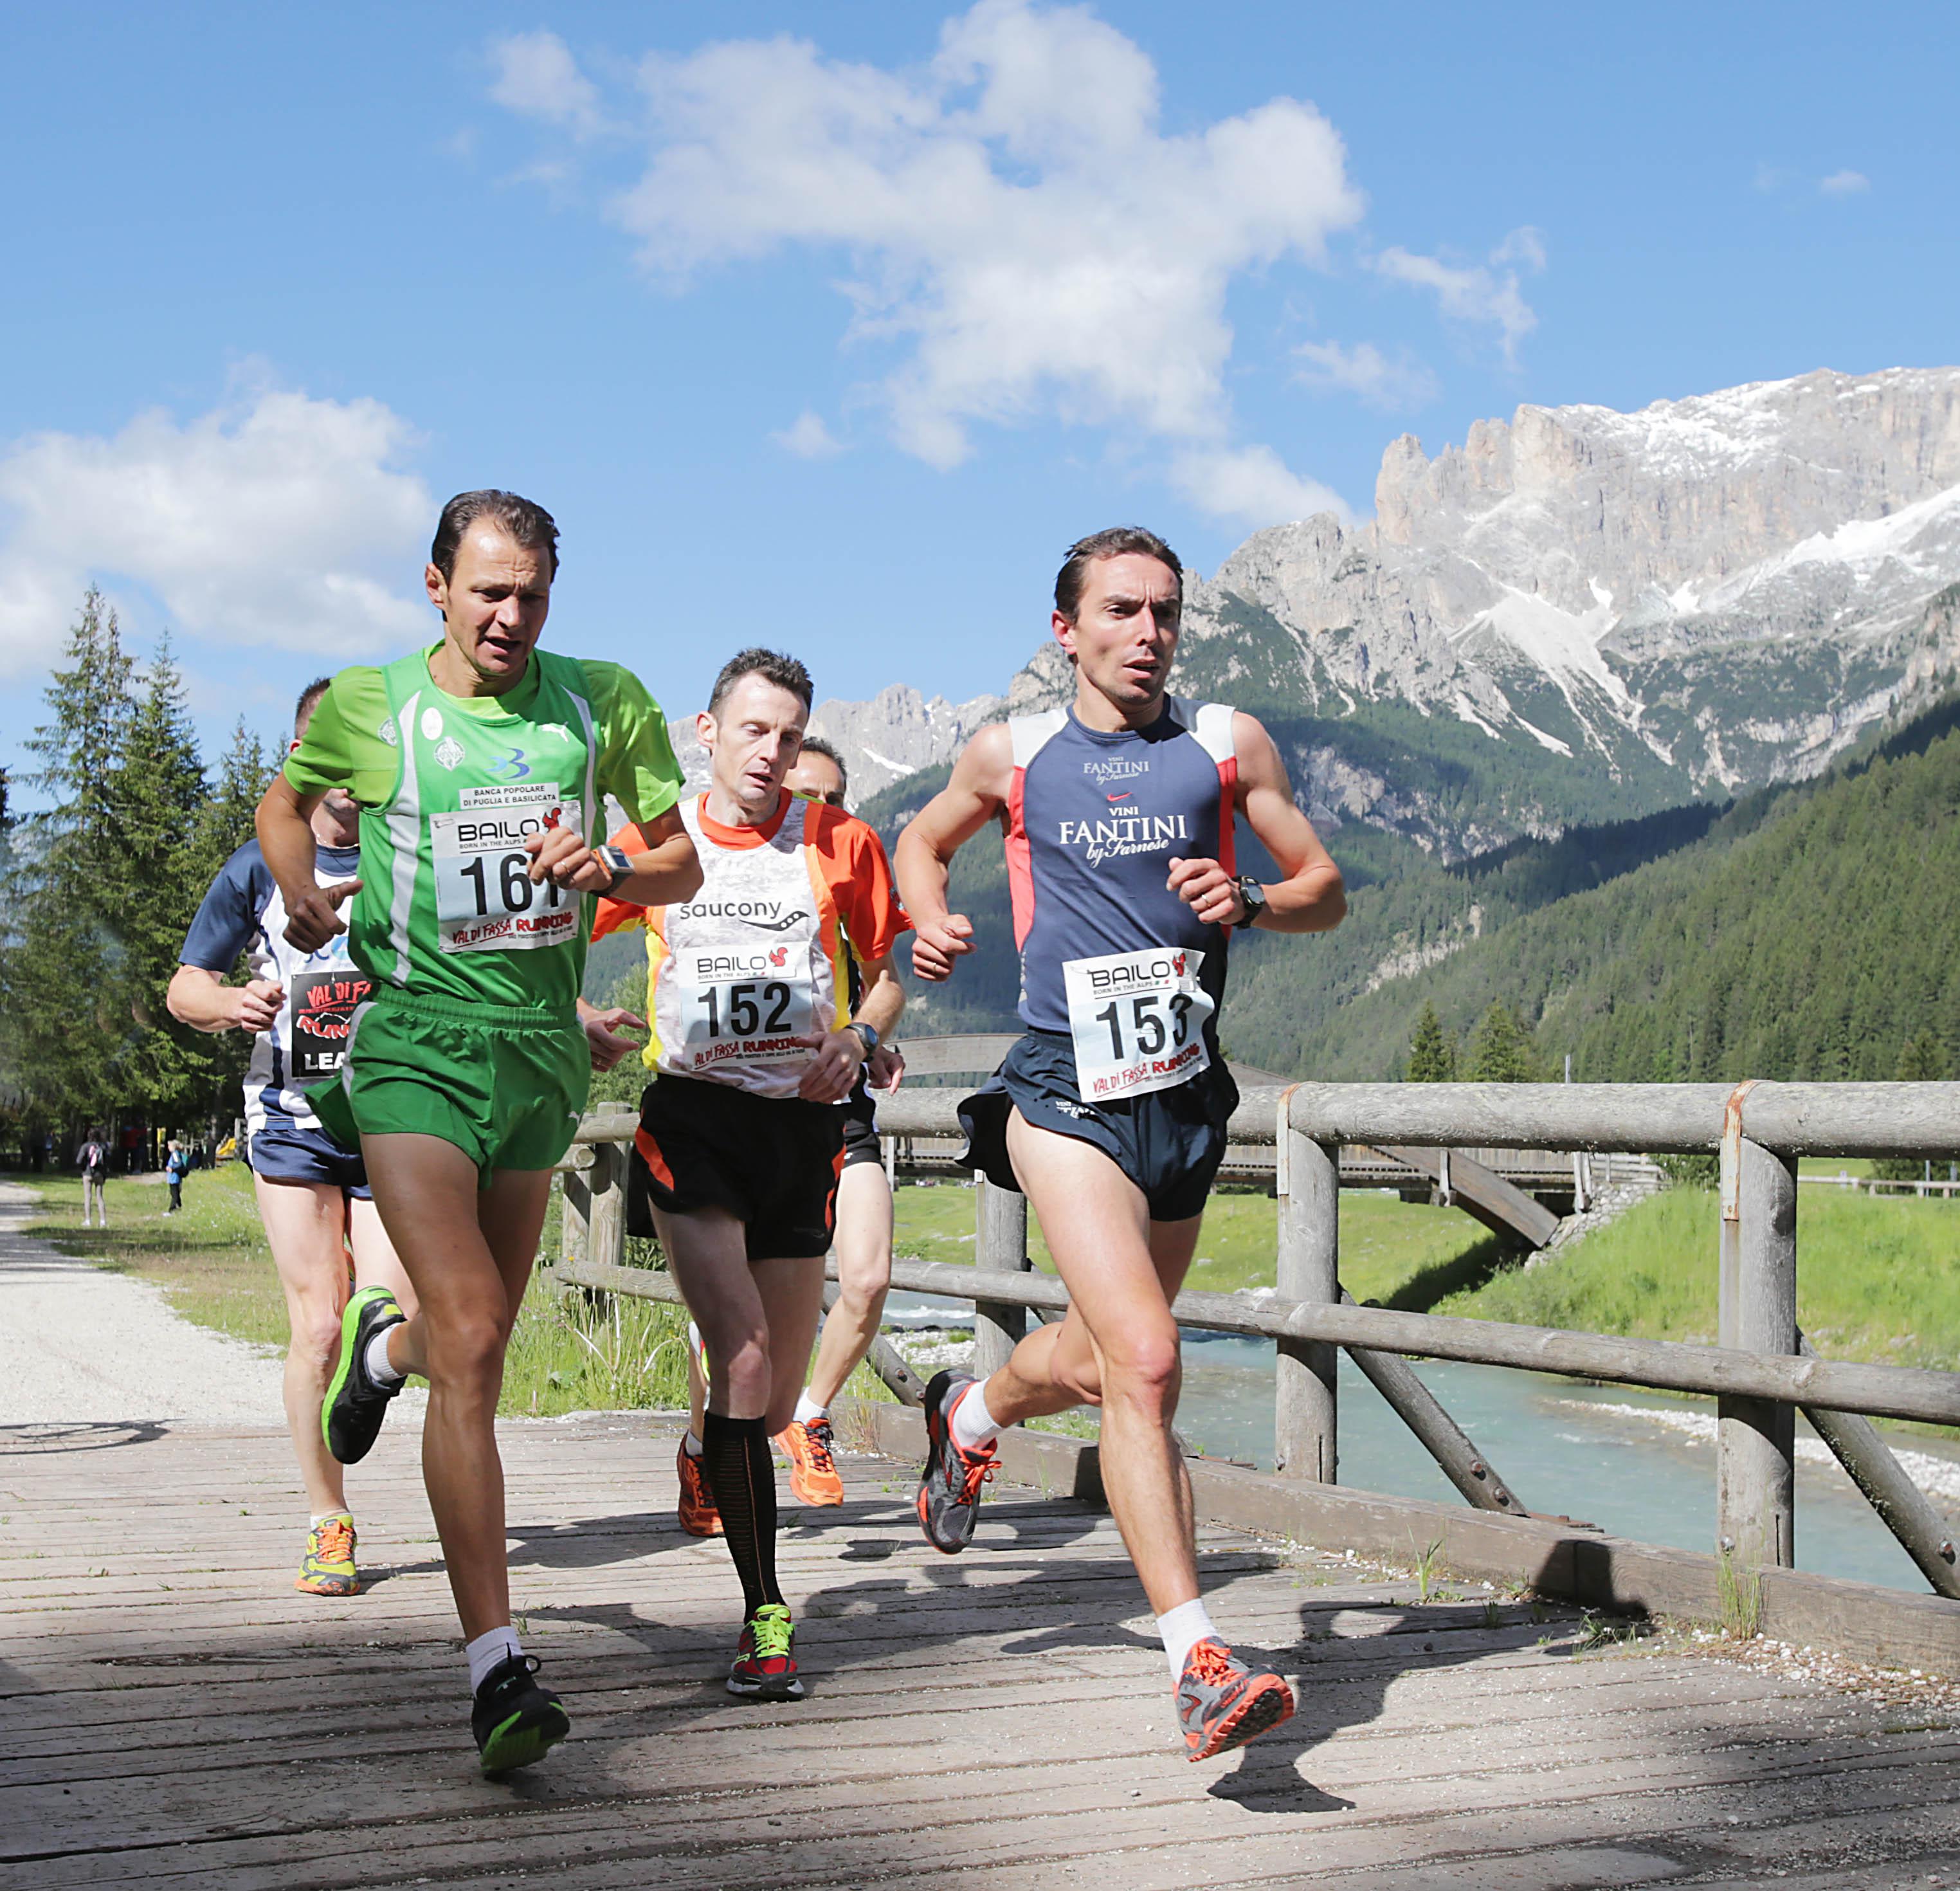 Val di Fassa Running 2013: la seconda tappa